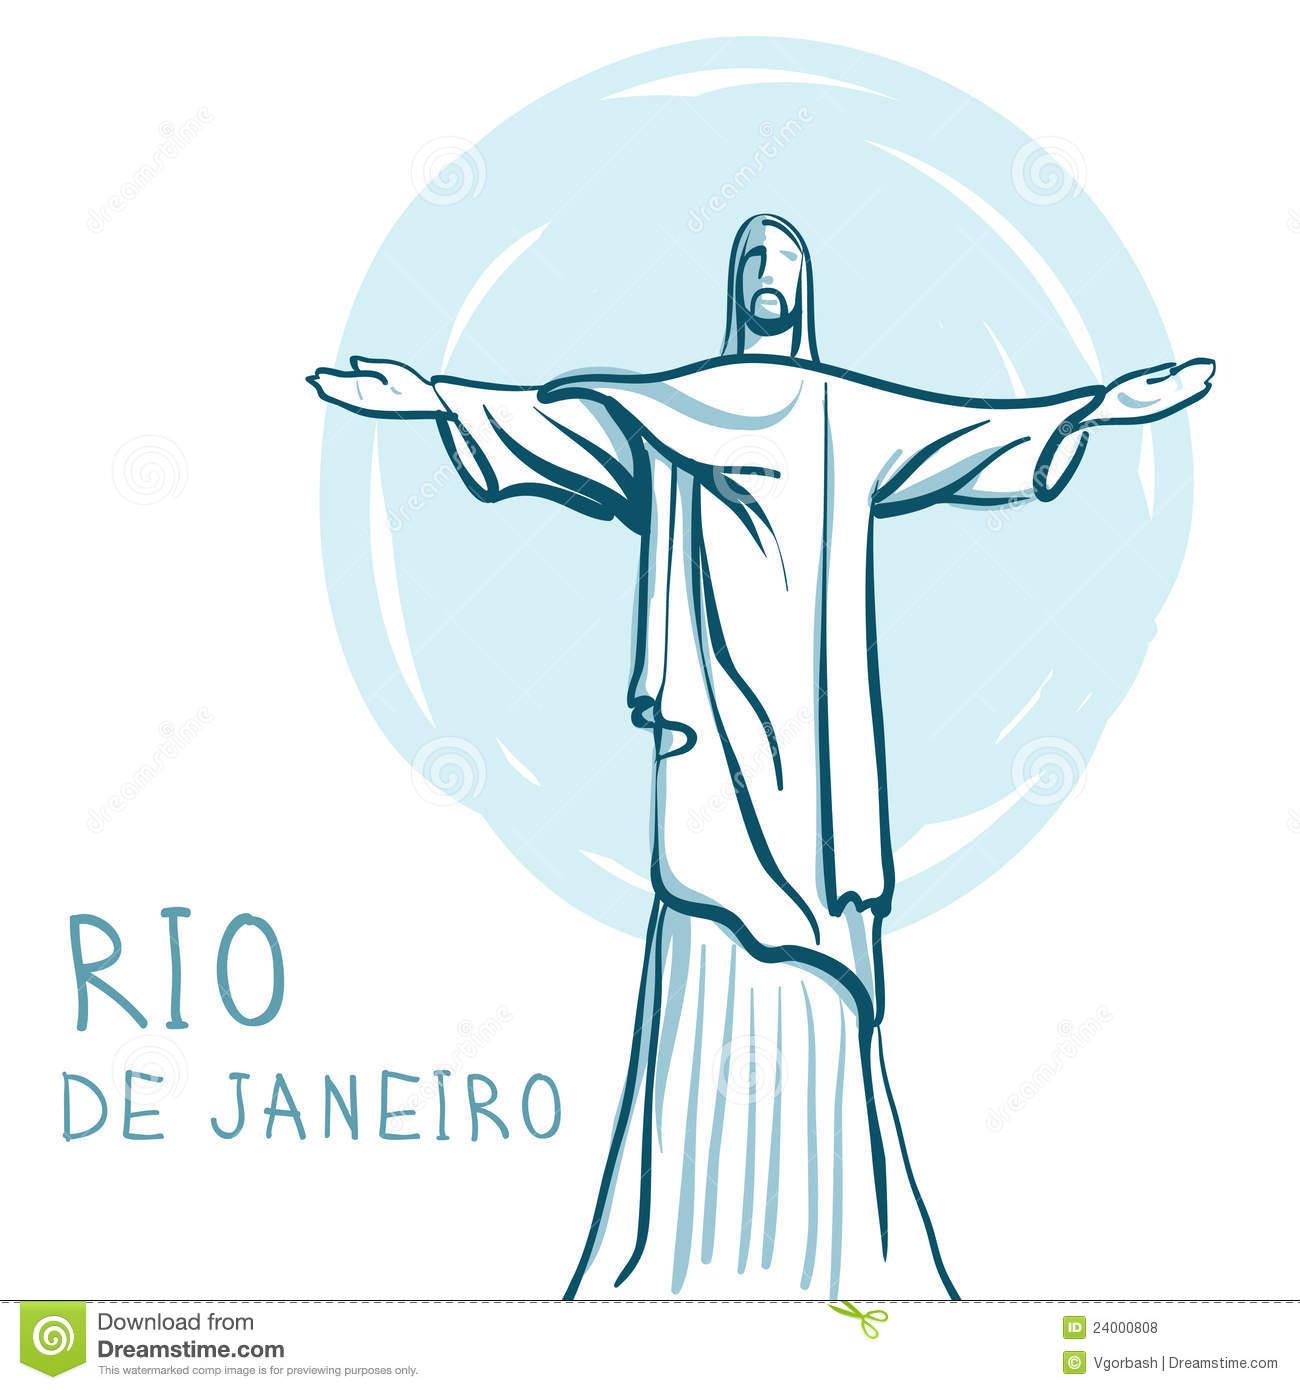 Rio De Janeiro And Christ The Redeemer, Brazil Royalty Free Stock.